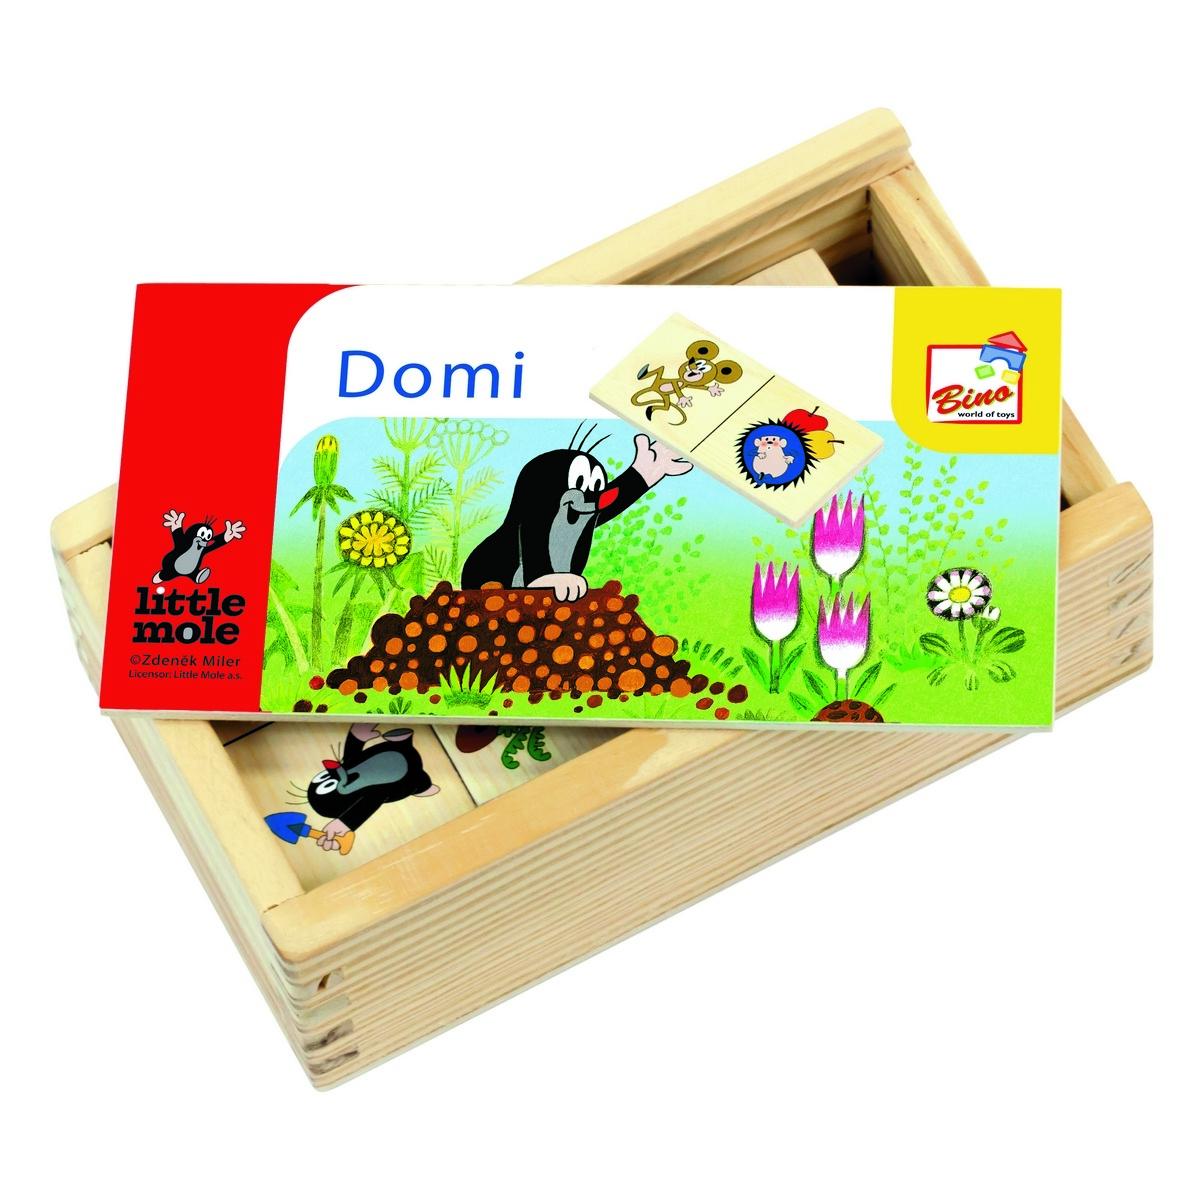 Obrázkové domino krtek, 28 dílků